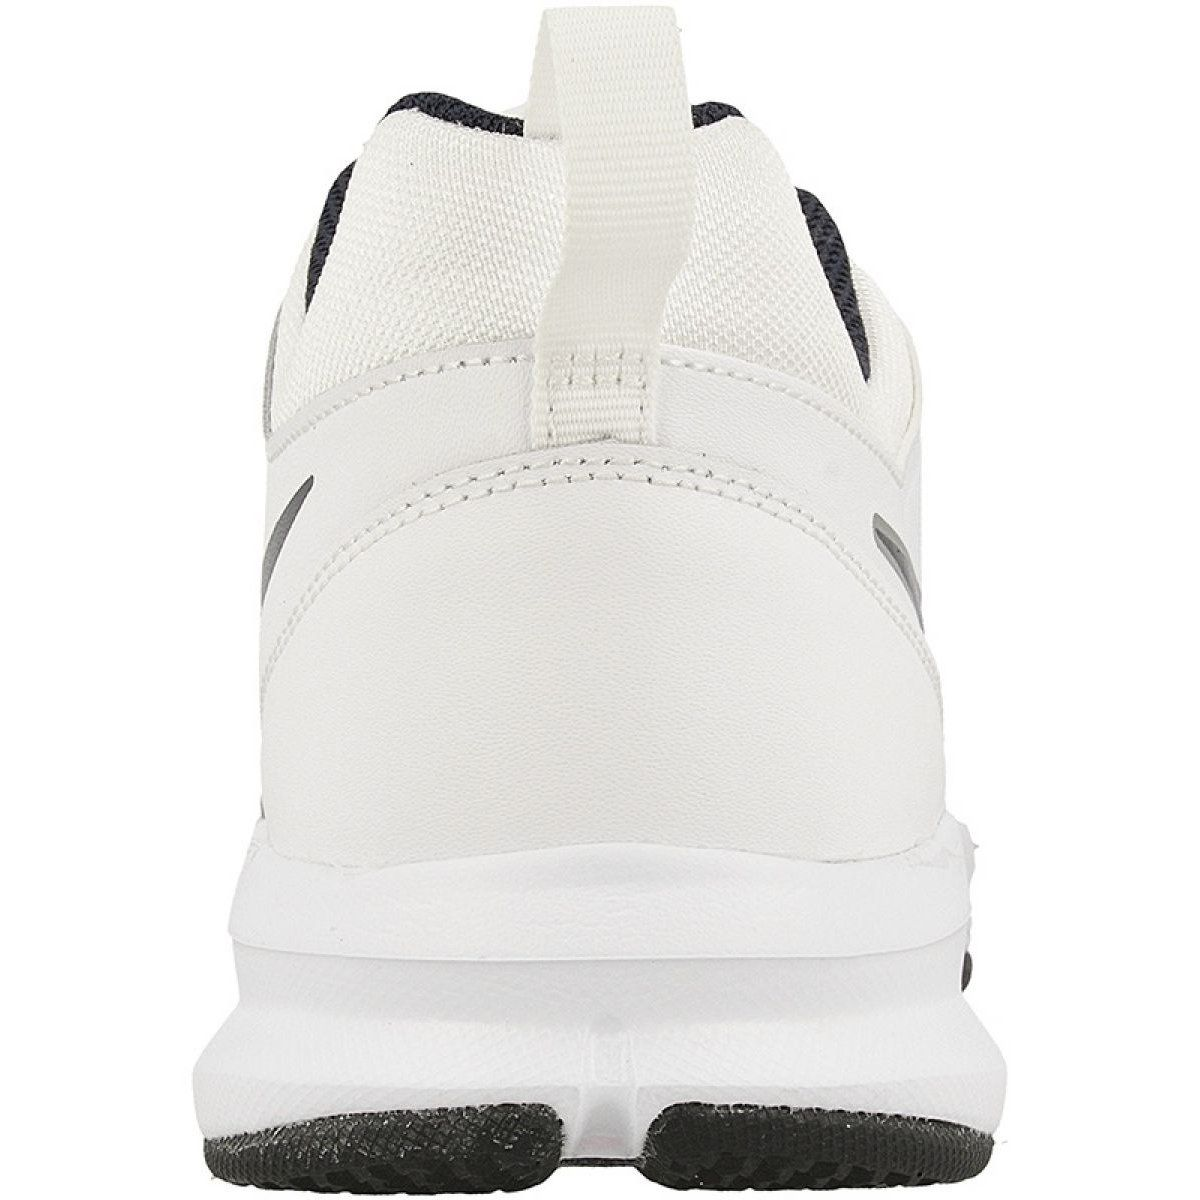 Buty Treningowe Nike T Lite Xi M 616544 101 Biale Nike Training Shoes Training Shoes Nike Shoes